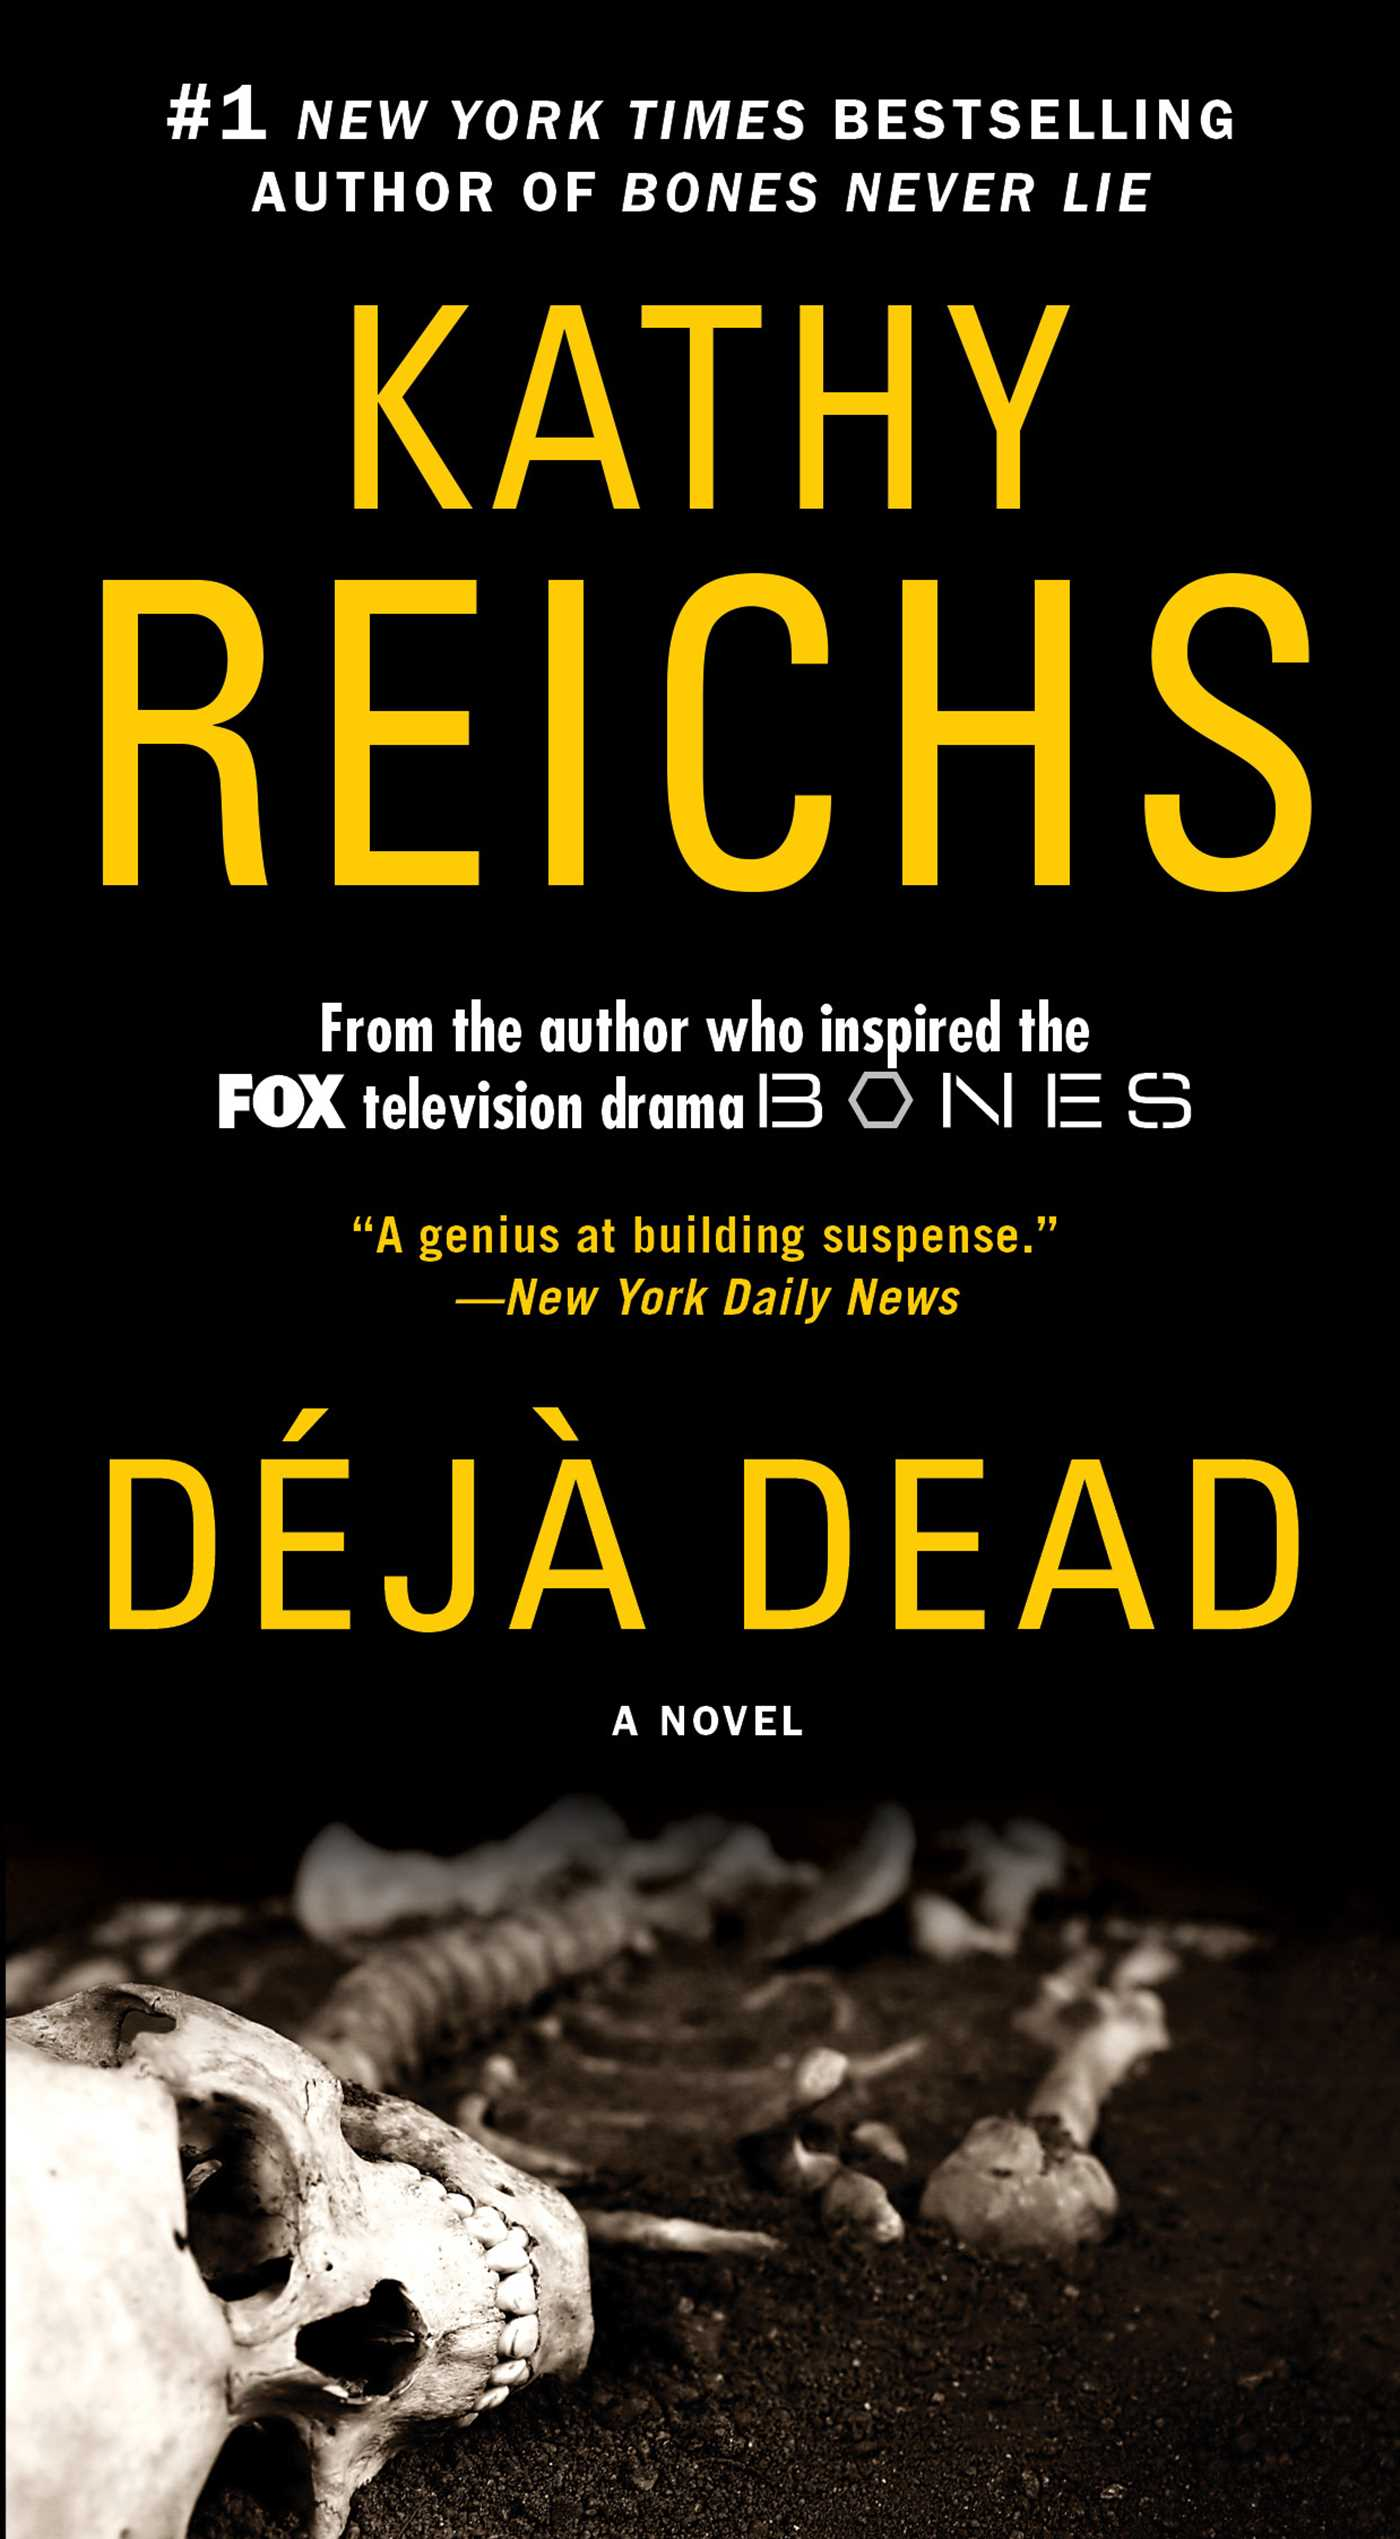 Book Cover Image (jpg): Deja Dead